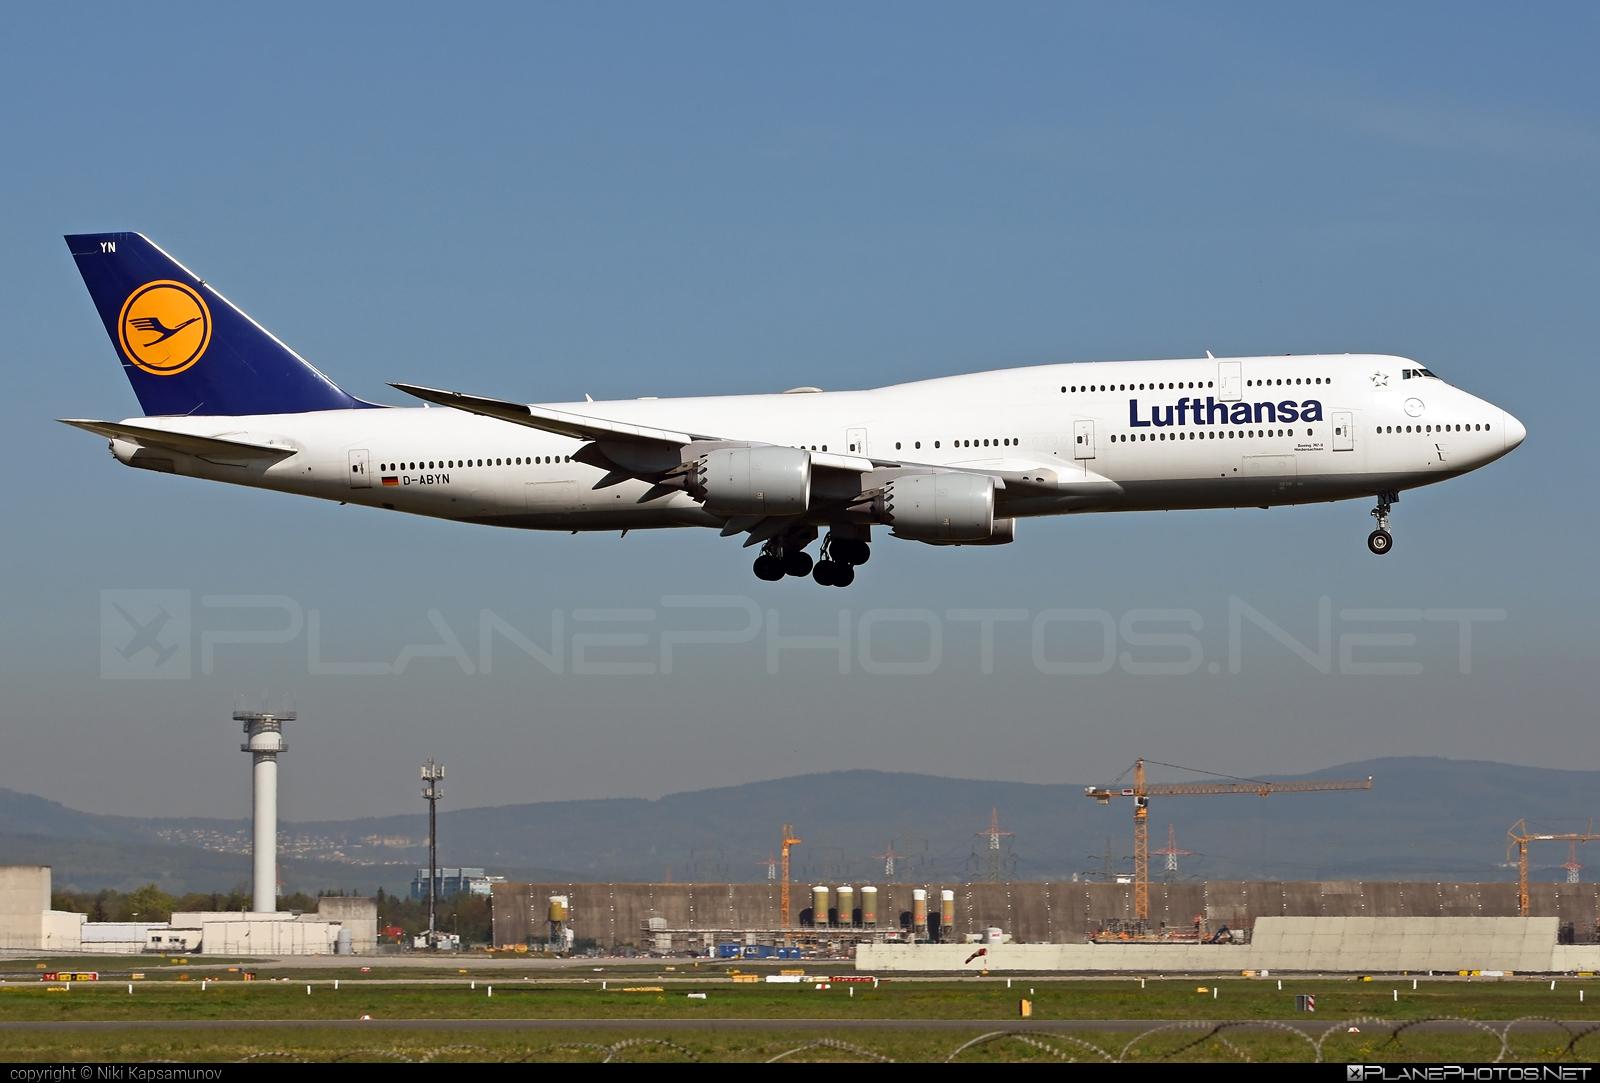 Boeing 747-8 - D-ABYN operated by Lufthansa #b747 #boeing #boeing747 #jumbo #lufthansa